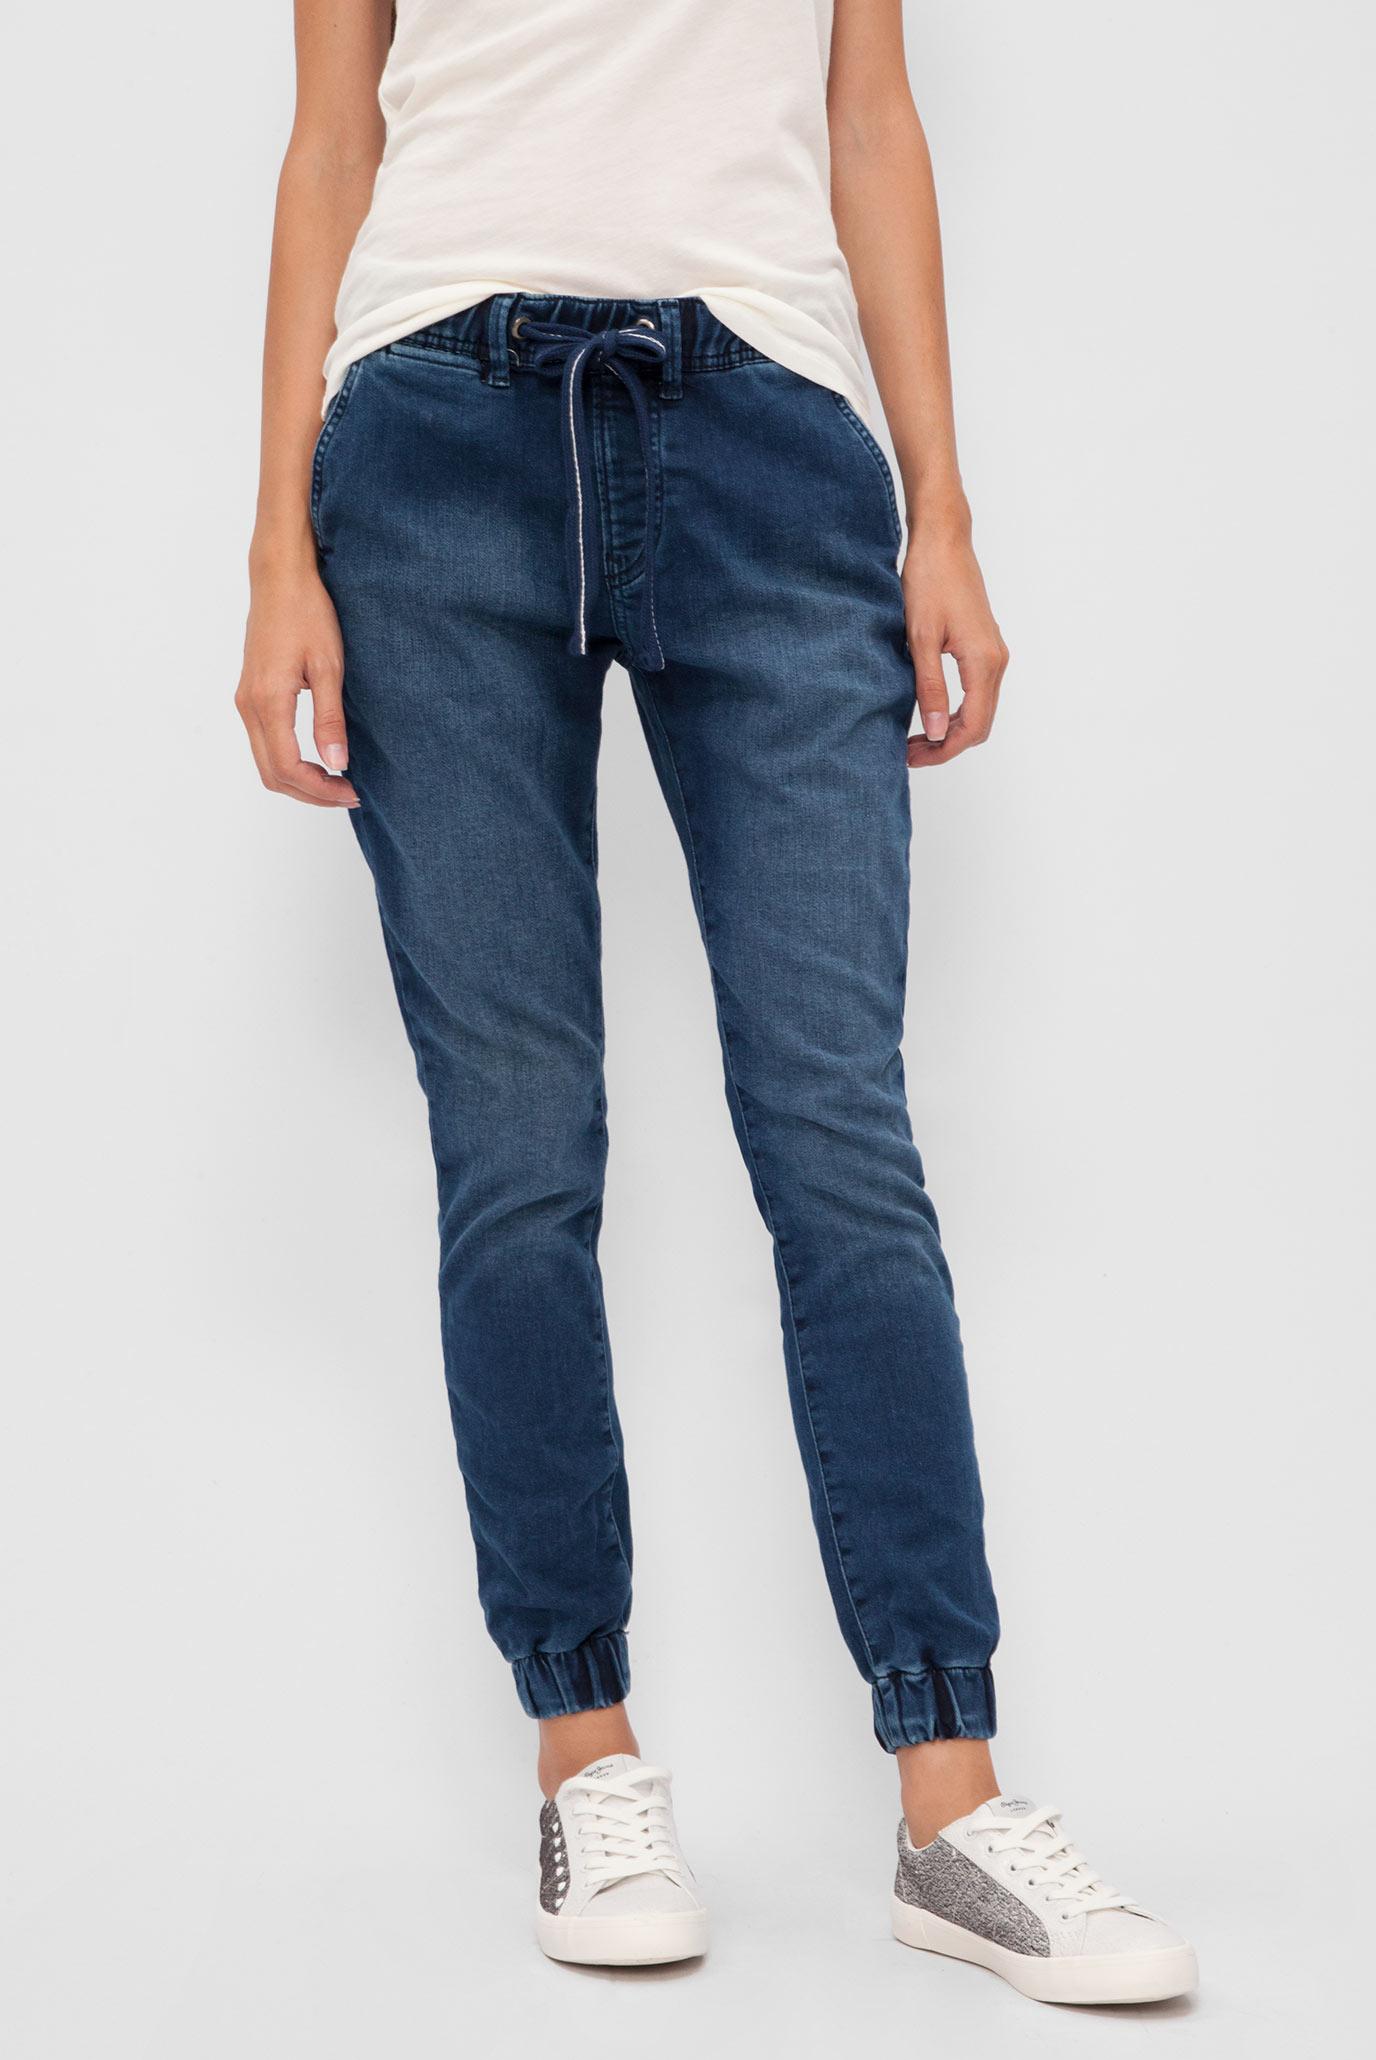 18fddca5dae Купить Женские синие джоггеры COSIE Pepe Jeans Pepe Jeans PL201692N50R –  Киев